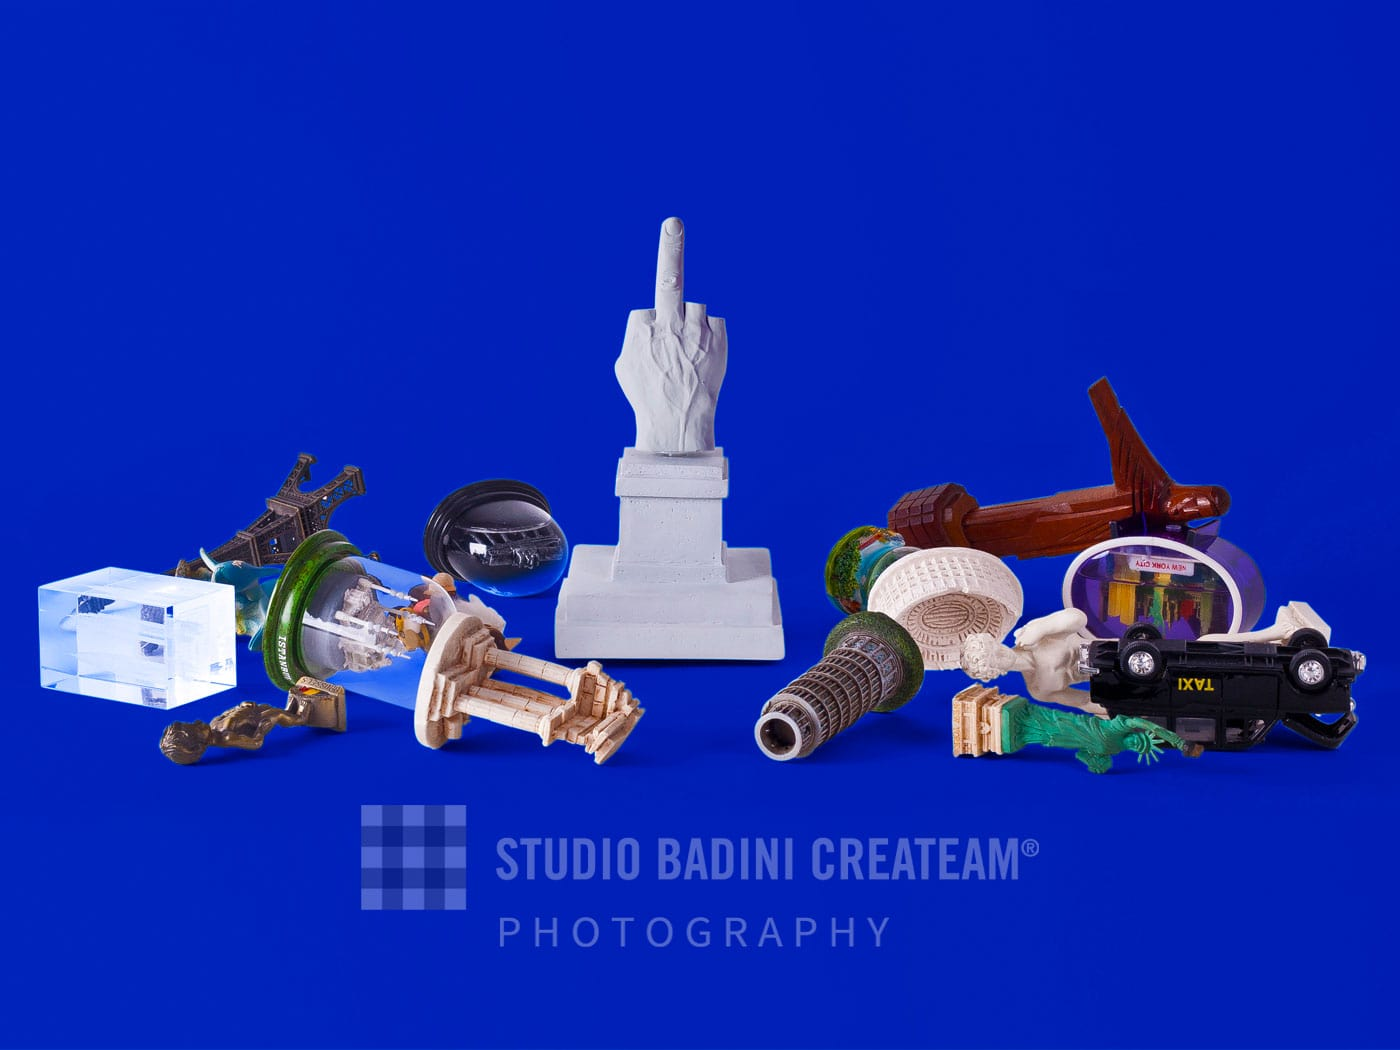 Badini Creative Studio - fotografia - toiletpaper